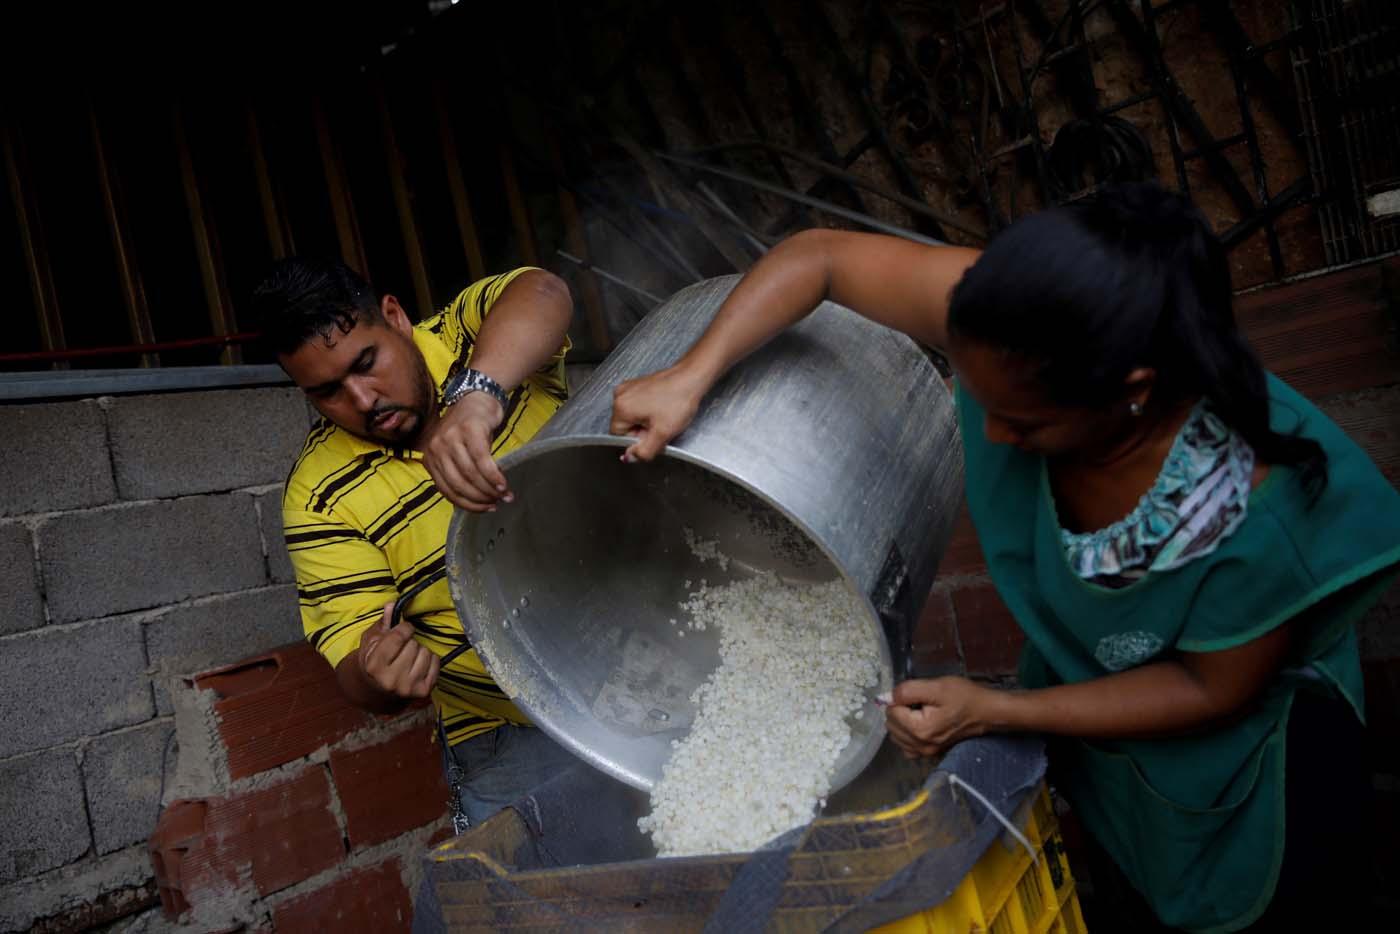 Medical equipment repairman Leandro Colmenares (L) makes corn dough at the backyard of his house in Caracas, Venezuela October 3, 2017. Picture taken October 3, 2017. REUTERS/Carlos Garcia Rawlins